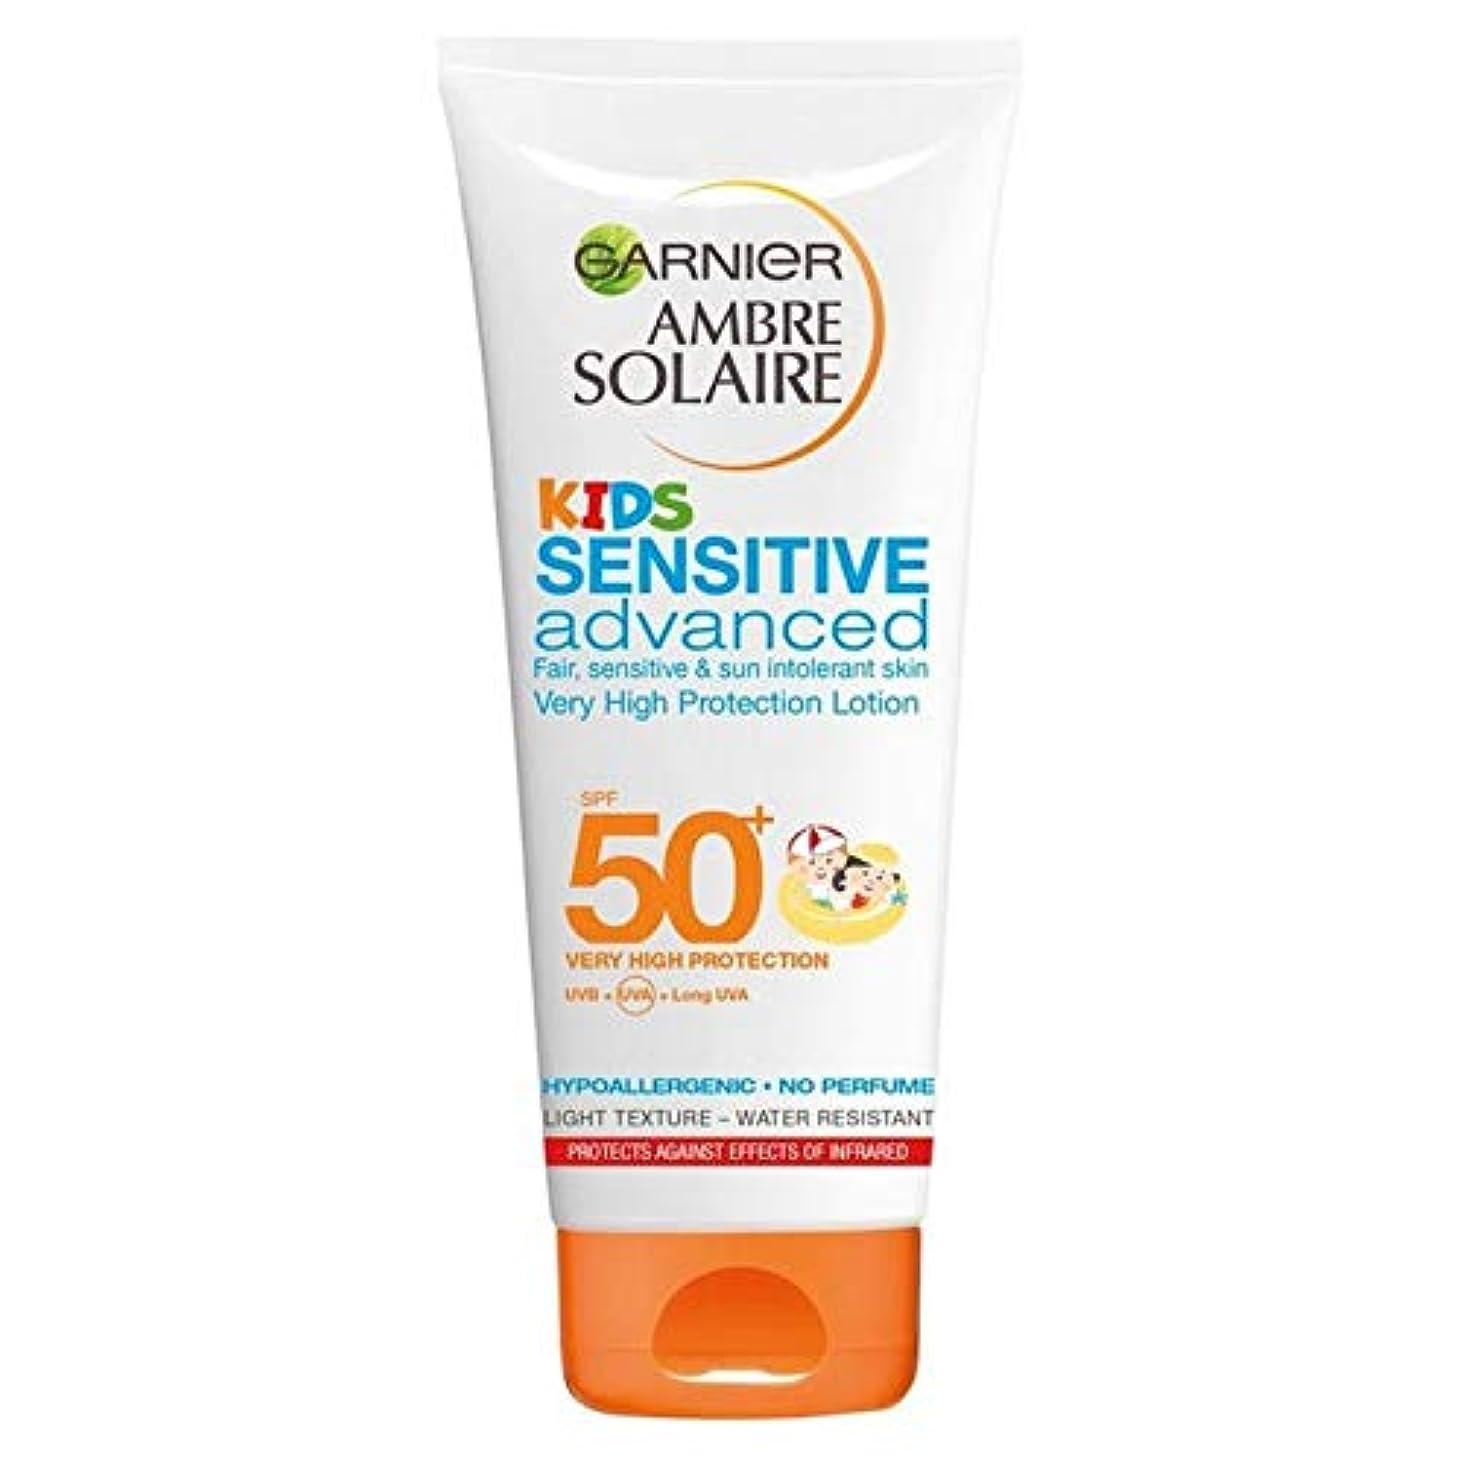 [Garnier ] アンブレSolaire子供敏感日クリームローションSpf50 + 200ミリリットル - Ambre Solaire Kids Sensitive Sun Cream Lotion SPF50+ 200ml...